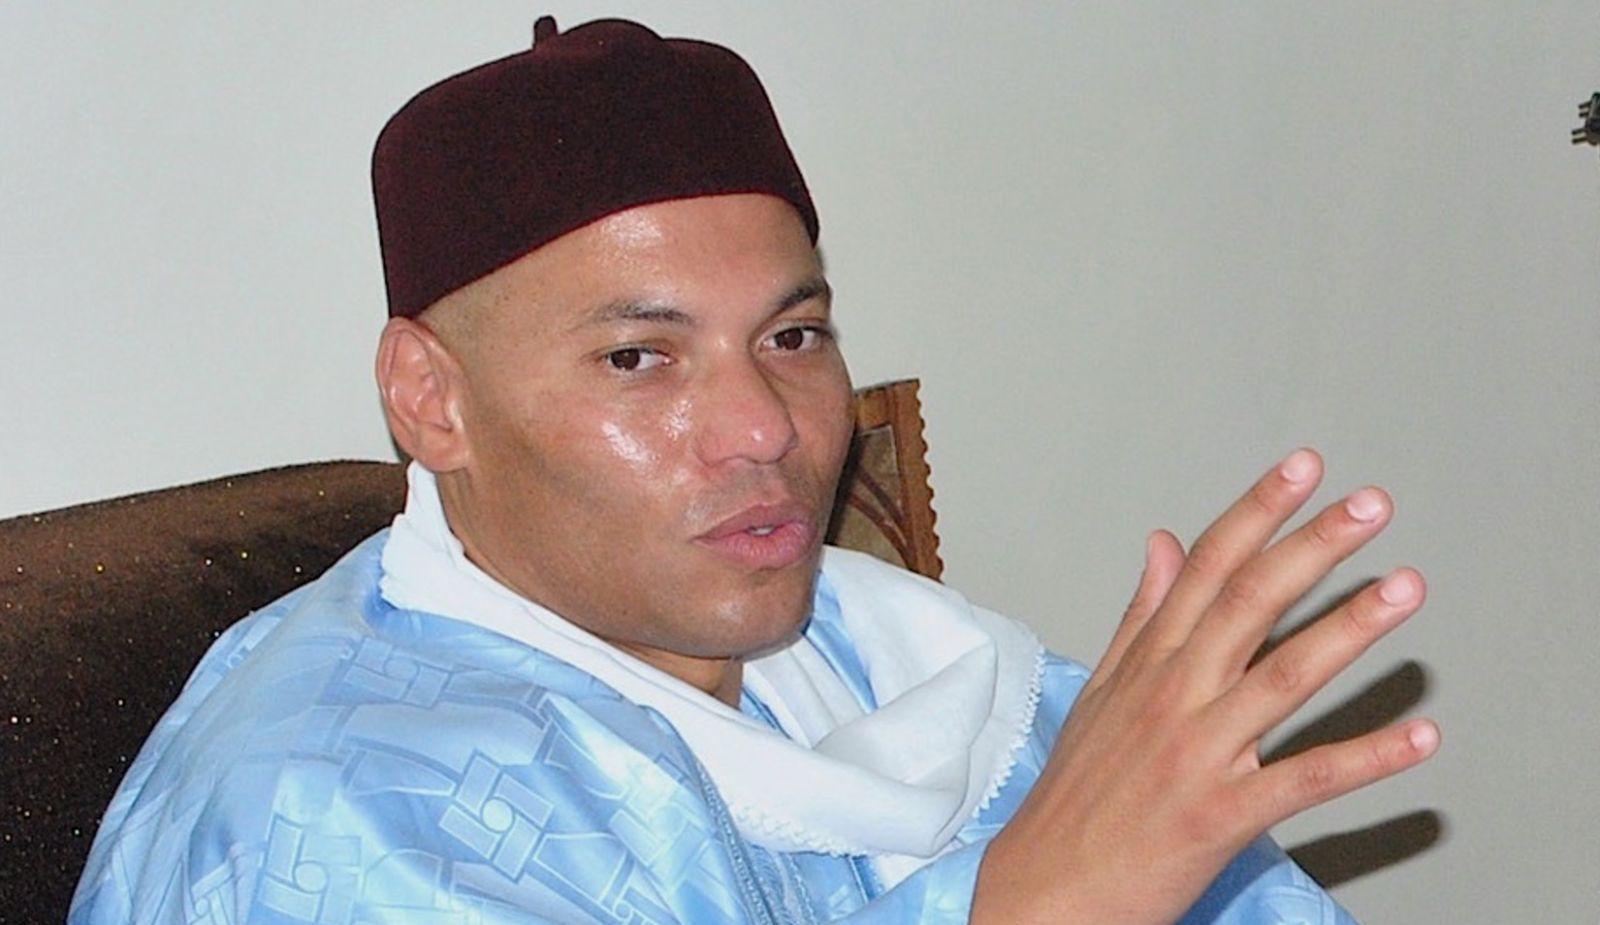 DEMANDE DE DELIVRANCE D'UNE NOTICE BLEUE CONTRE KARIM WADE PAR L'ETAT DU SENEGAL: Les avocats de Wade fils vilipendent Macky Sall et demandent le rejet de la requête